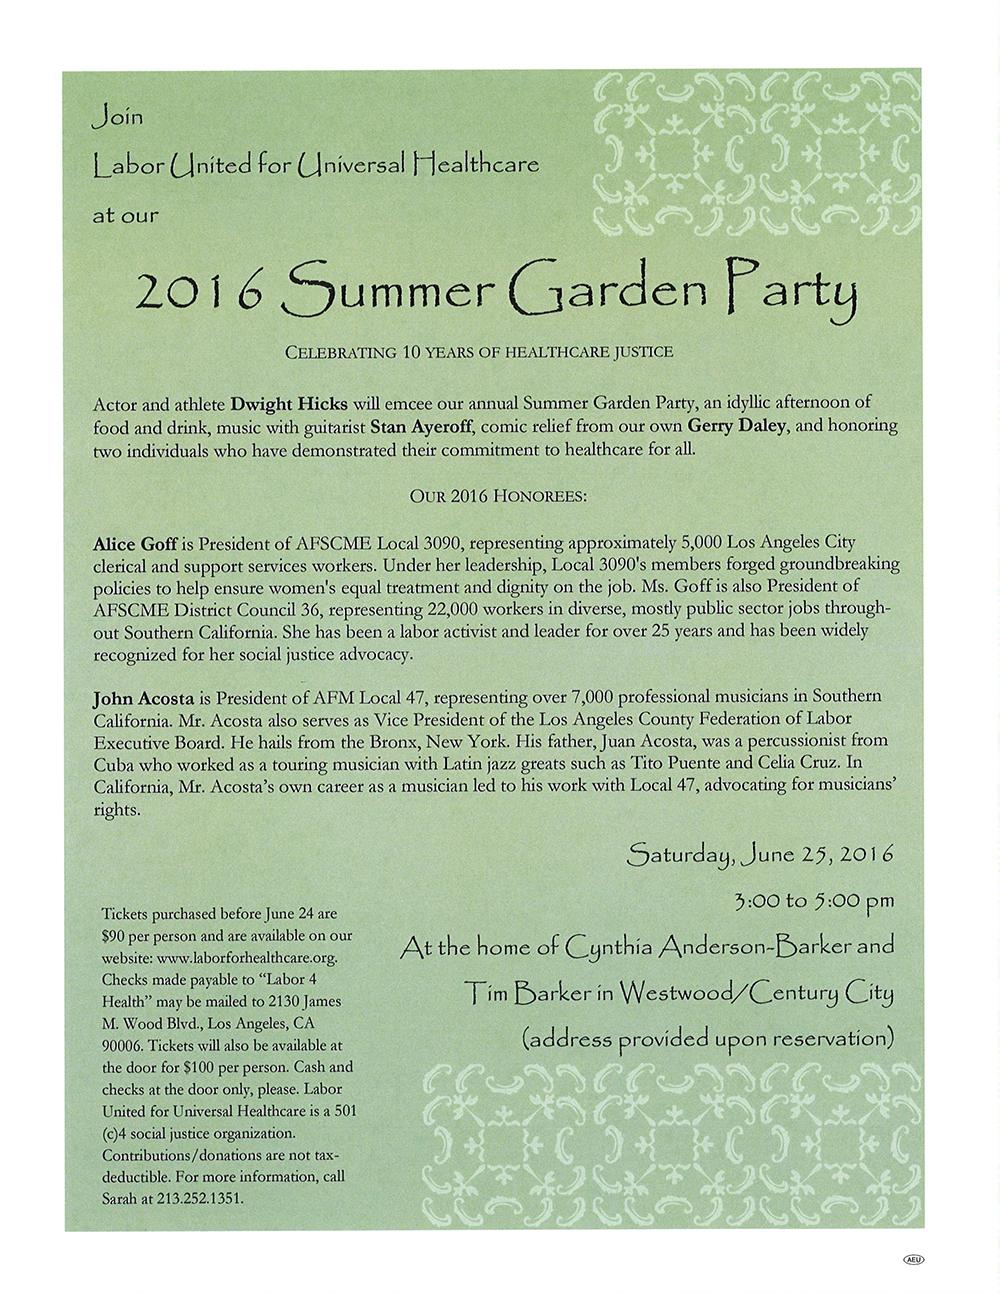 2016 Summer Garden Party